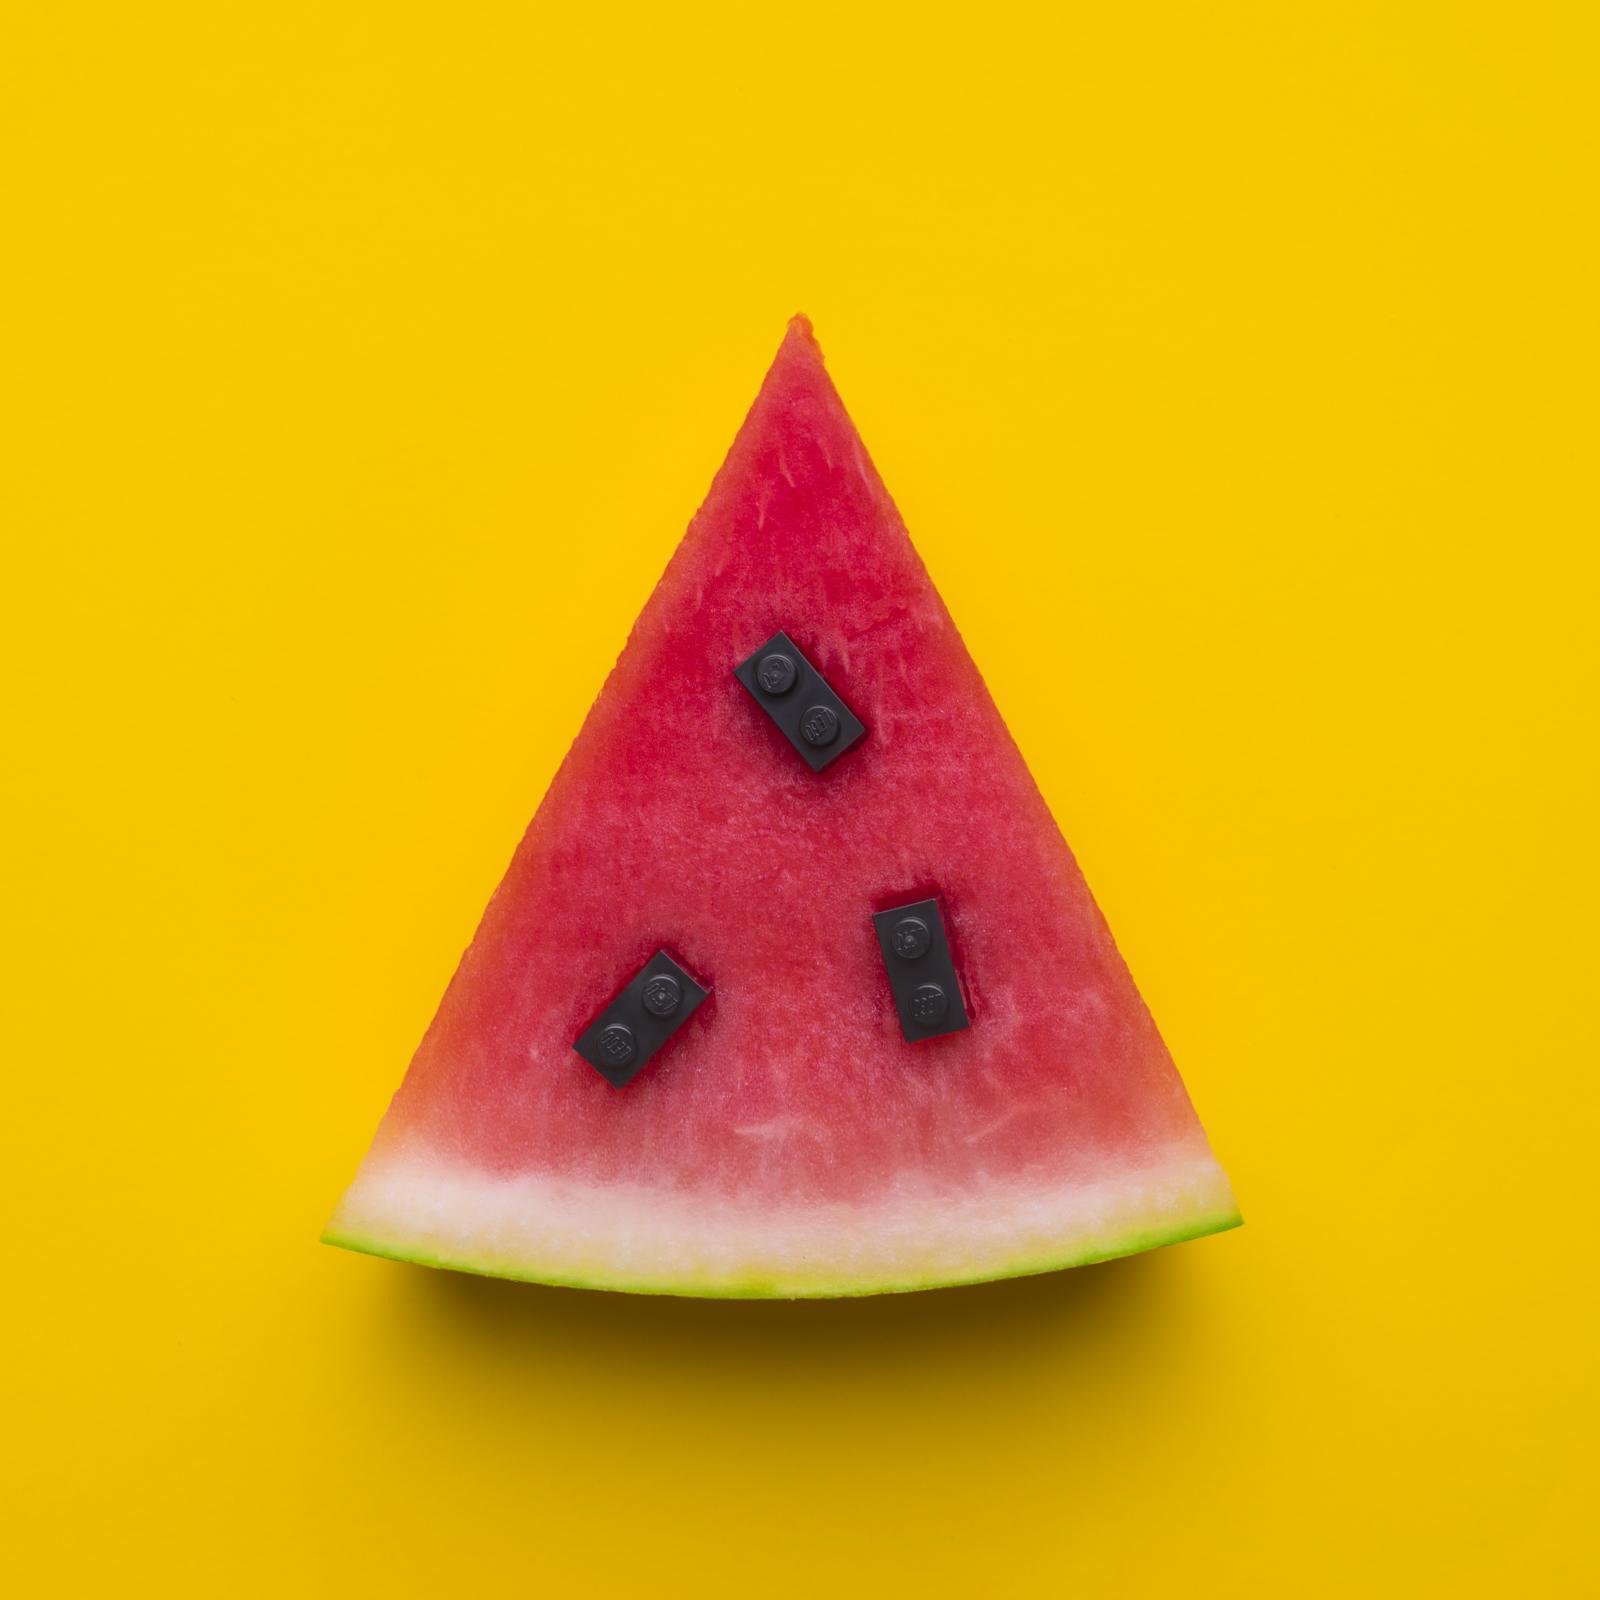 Watermelon (2017) - Jaime Sánchez